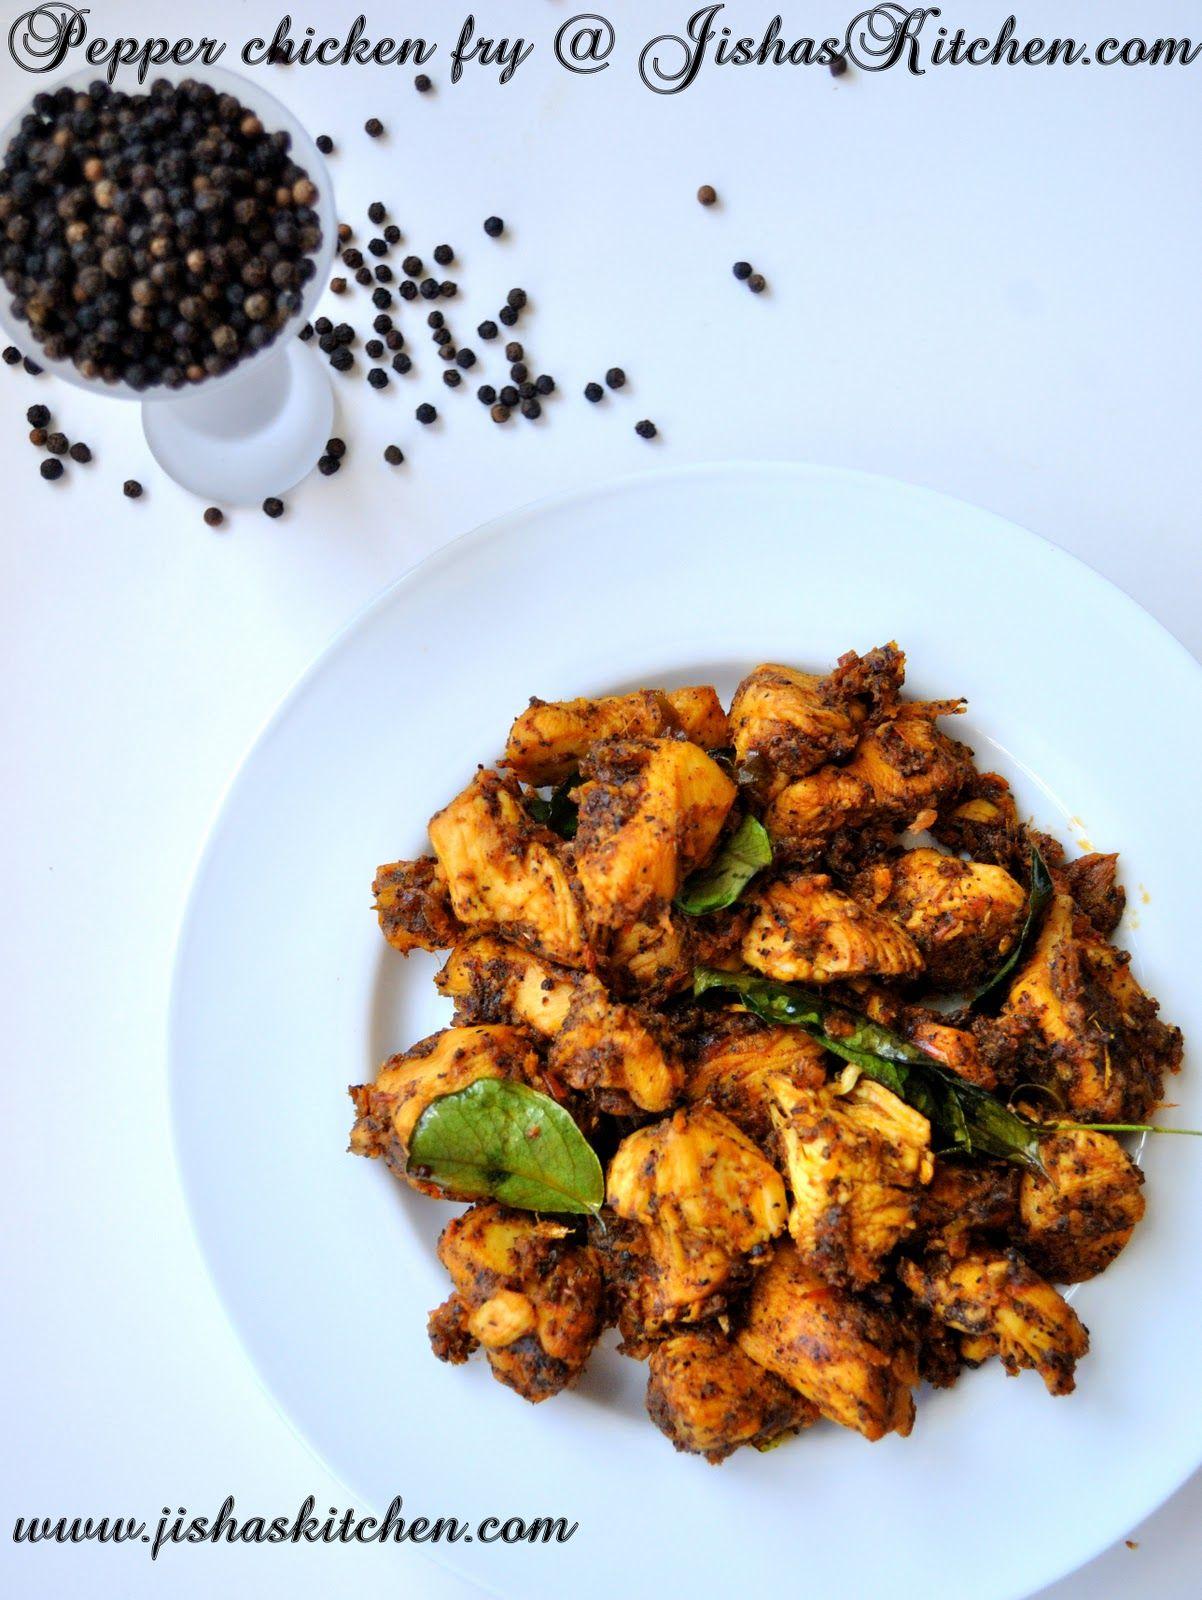 Jishas kitchen nadan chicken pepper fry indian recipes kerala nadan chicken pepper fry indian recipes kerala nadan recipes forumfinder Images